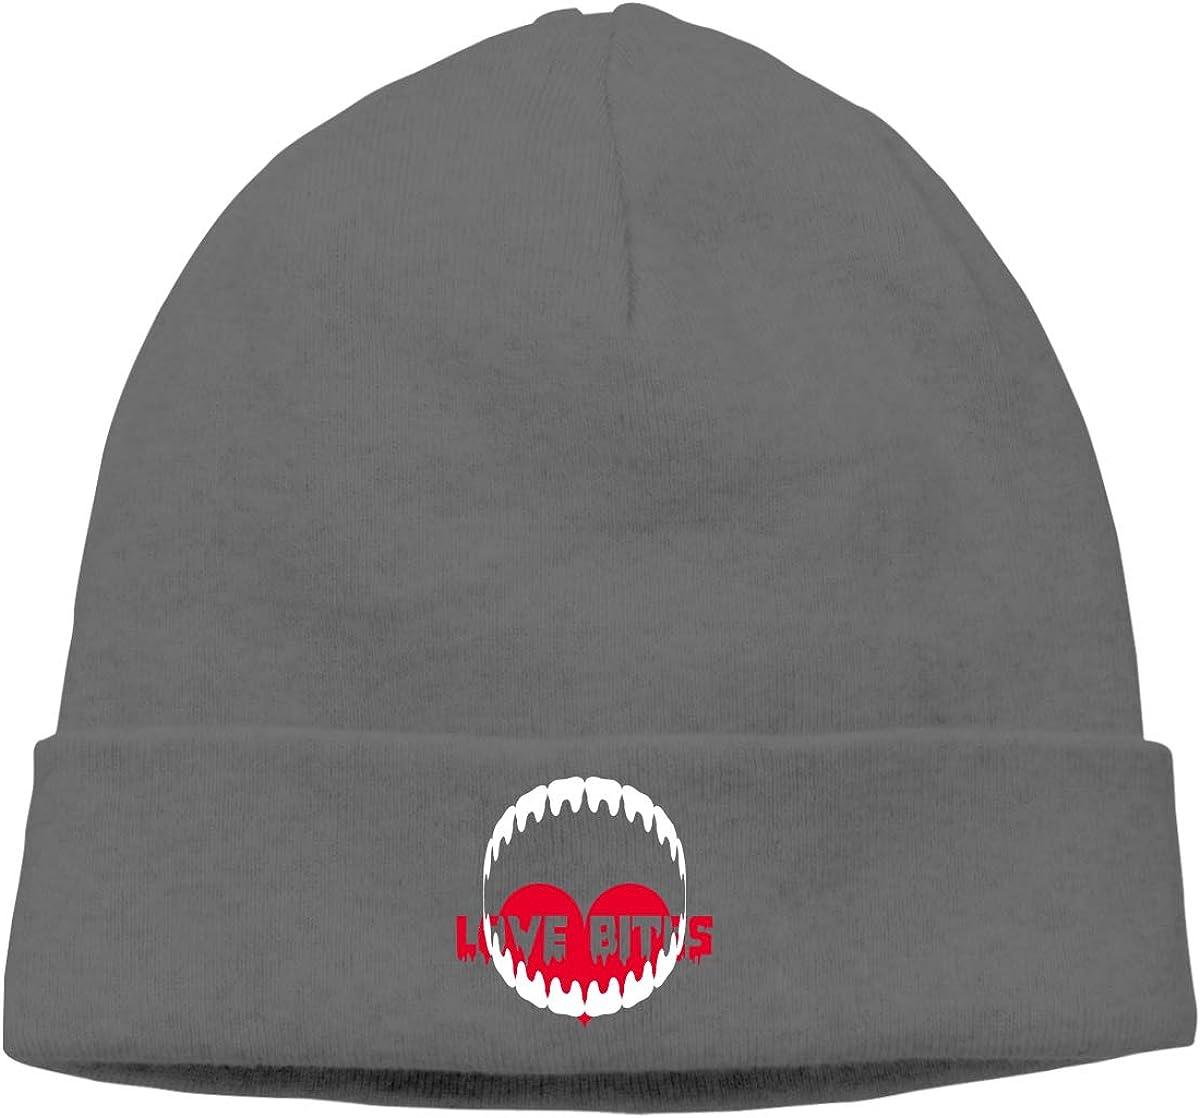 QZqDQ Oshea17 Unisex Fashion Knitted Hat Luxury Hip-Hop Cap